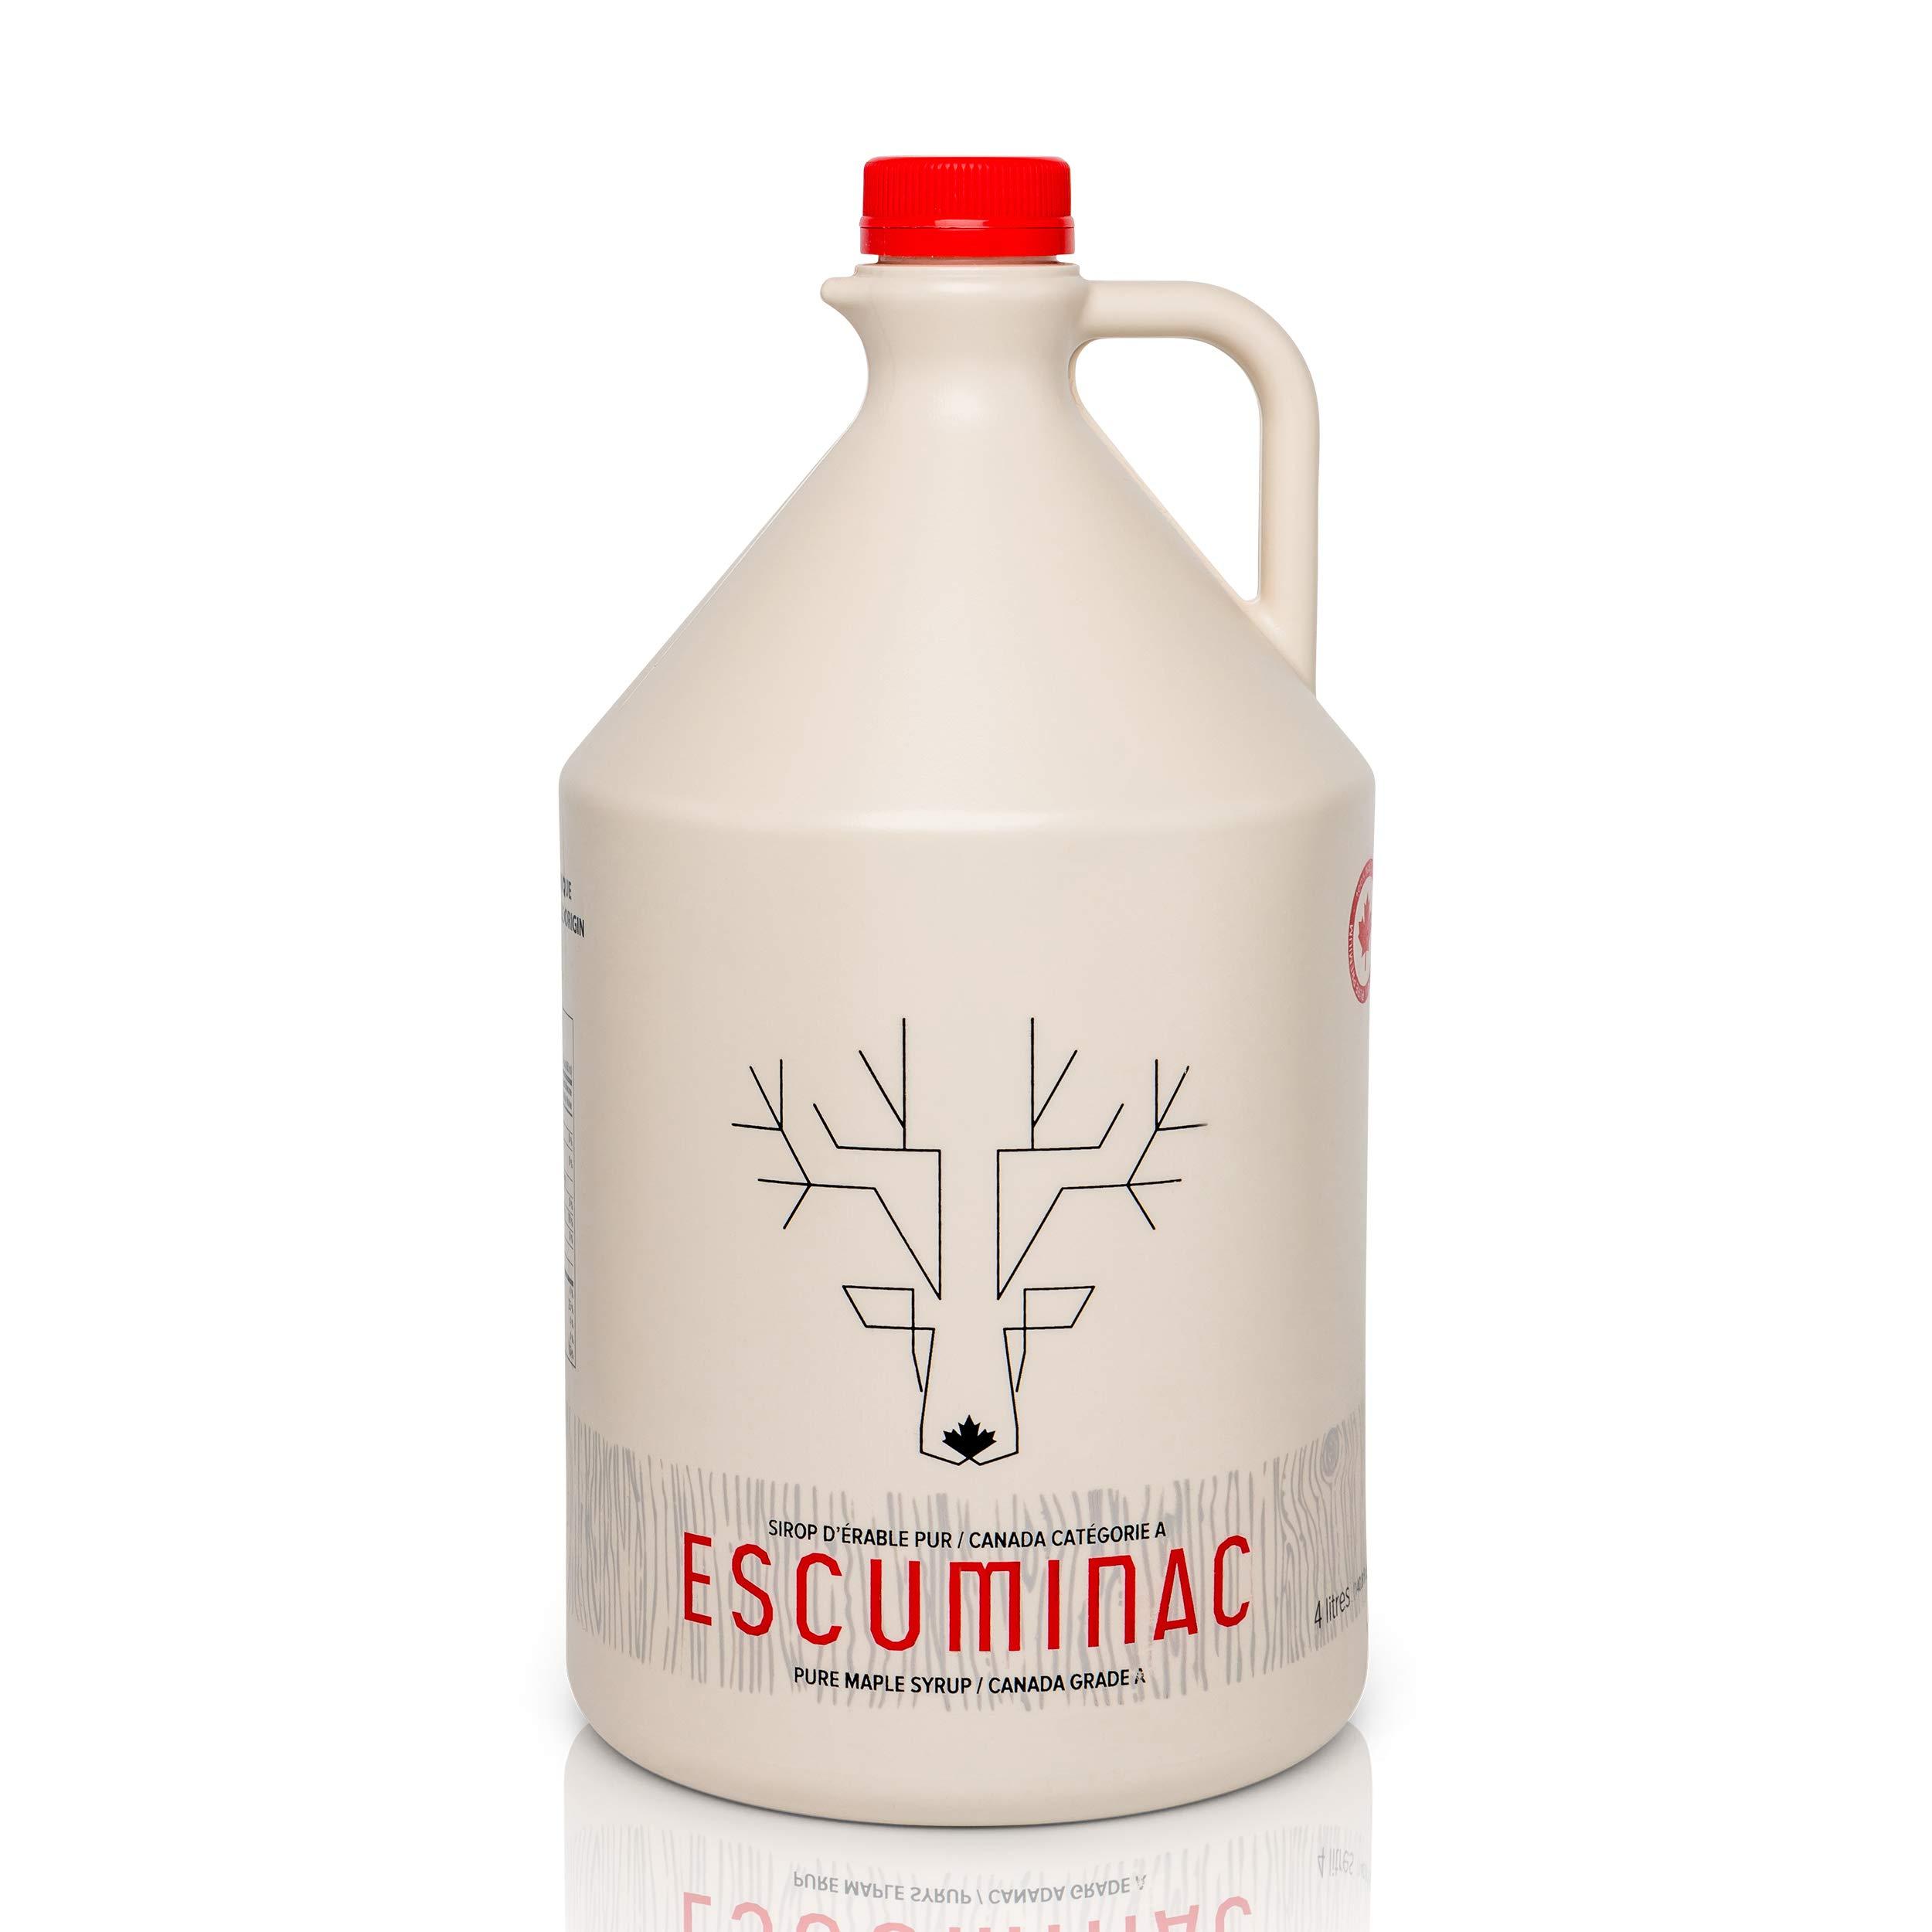 Award Winning Escuminac Great Harvest Canadian Maple Syrup. Restaurant, Chef Size 4 L (135 fl oz) Canada Grade A Dark Medium Taste - Pure, Organic, Single Origin, Unblended. by Escuminac